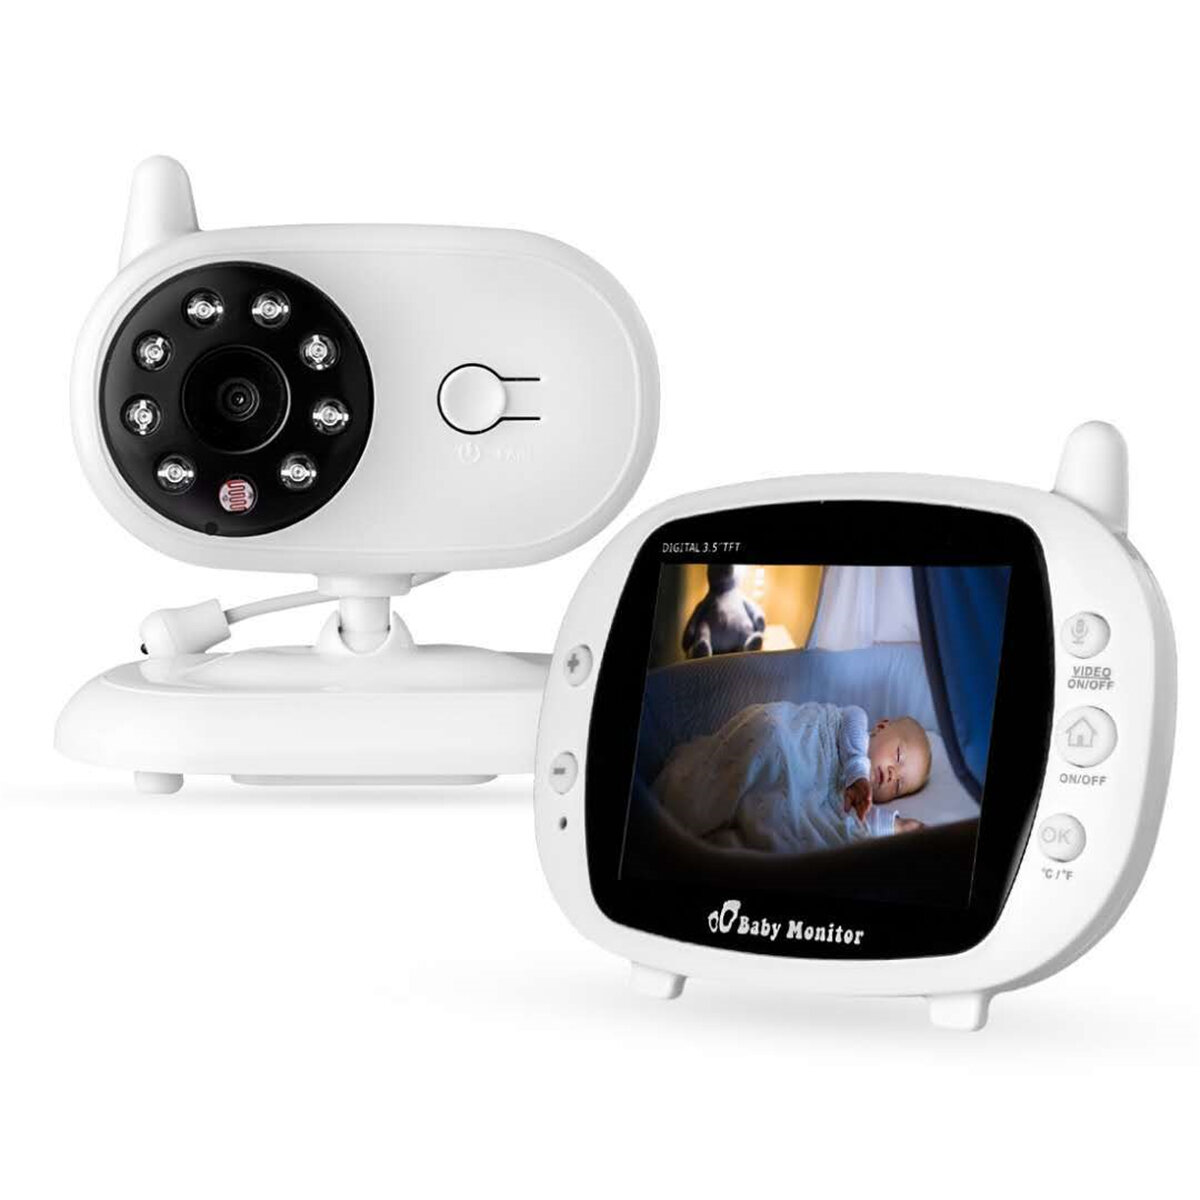 3.5 inch Baby Monitor 2.4GHz Video LCD Digital Camera Night Vision Temperature Monitoring Monitors, Banggood  - buy with discount